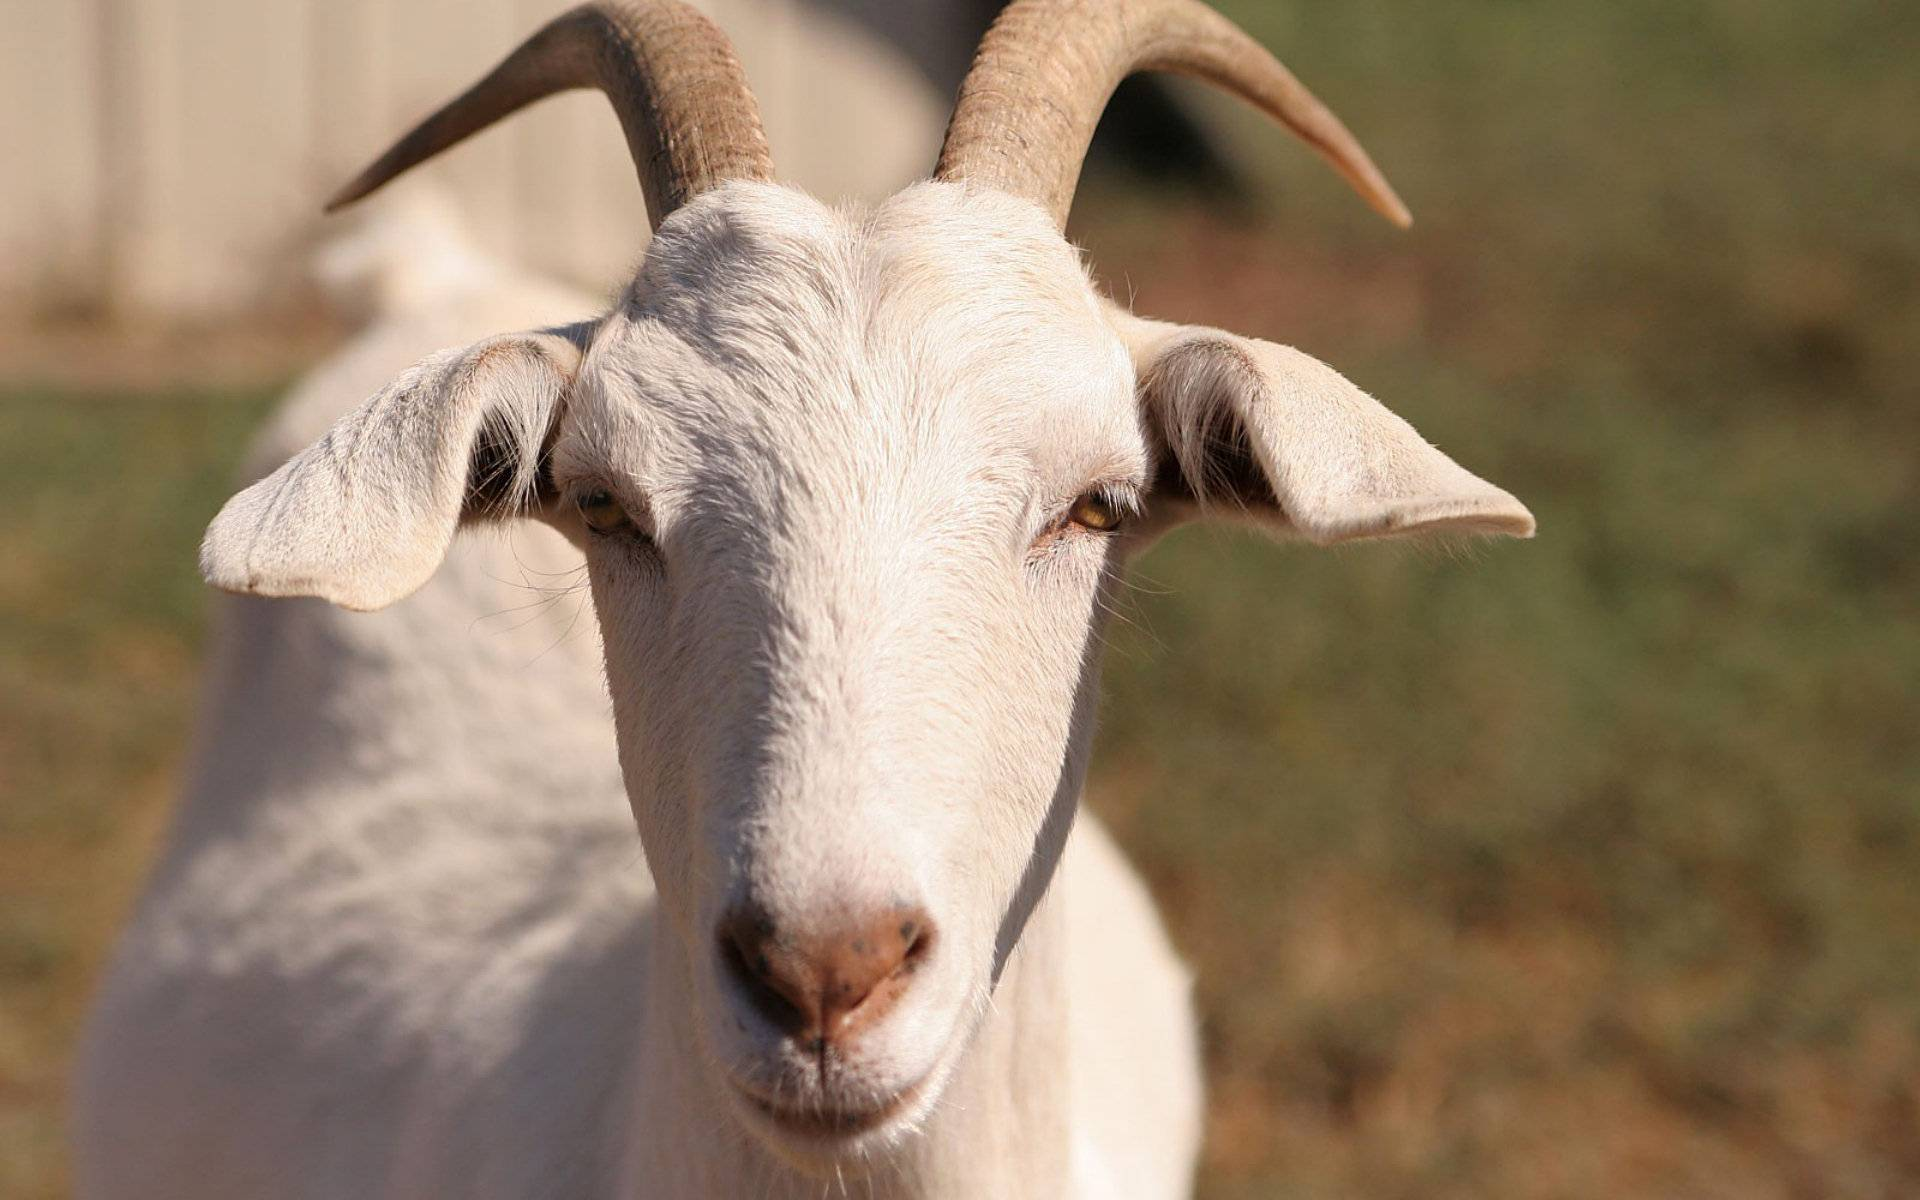 Уход и выращивание козлят в домашних условиях и на фермах 2020